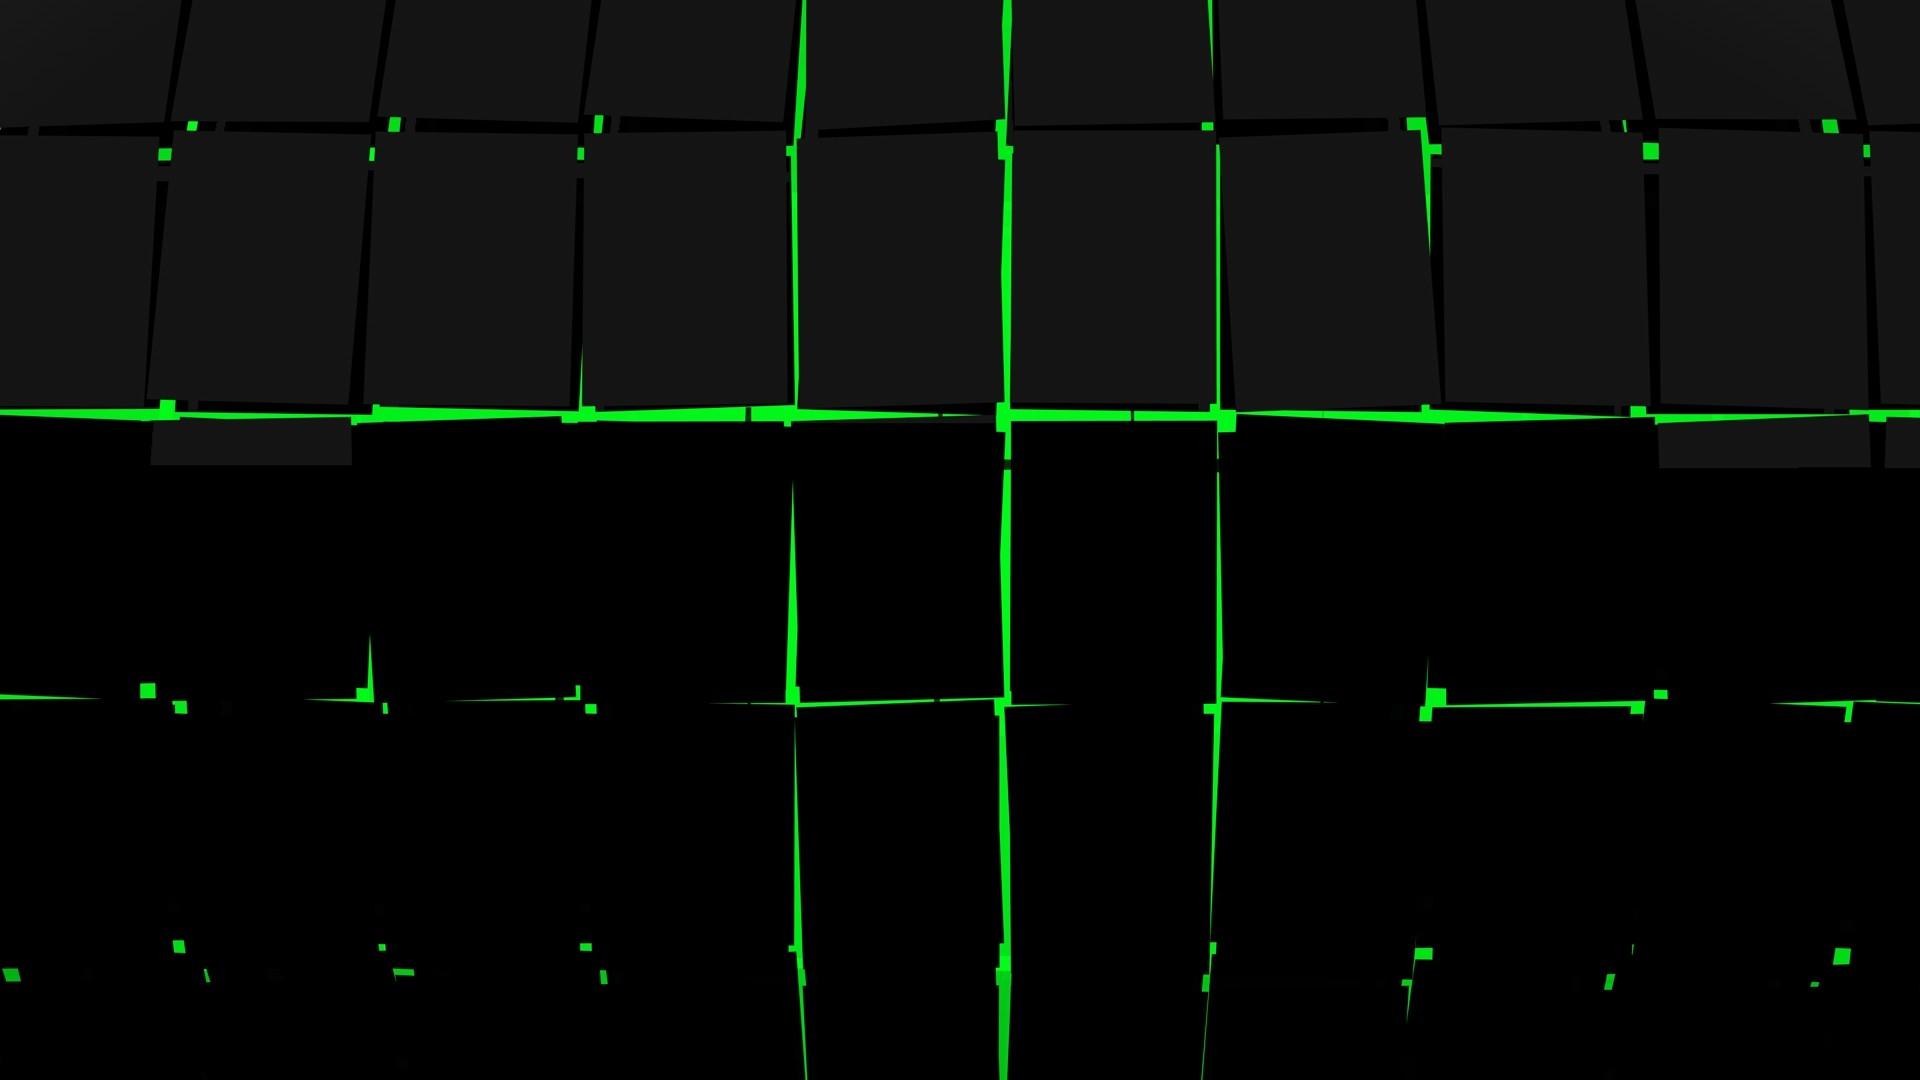 Download 8000 Wallpaper Black Green Abstract  Terbaru